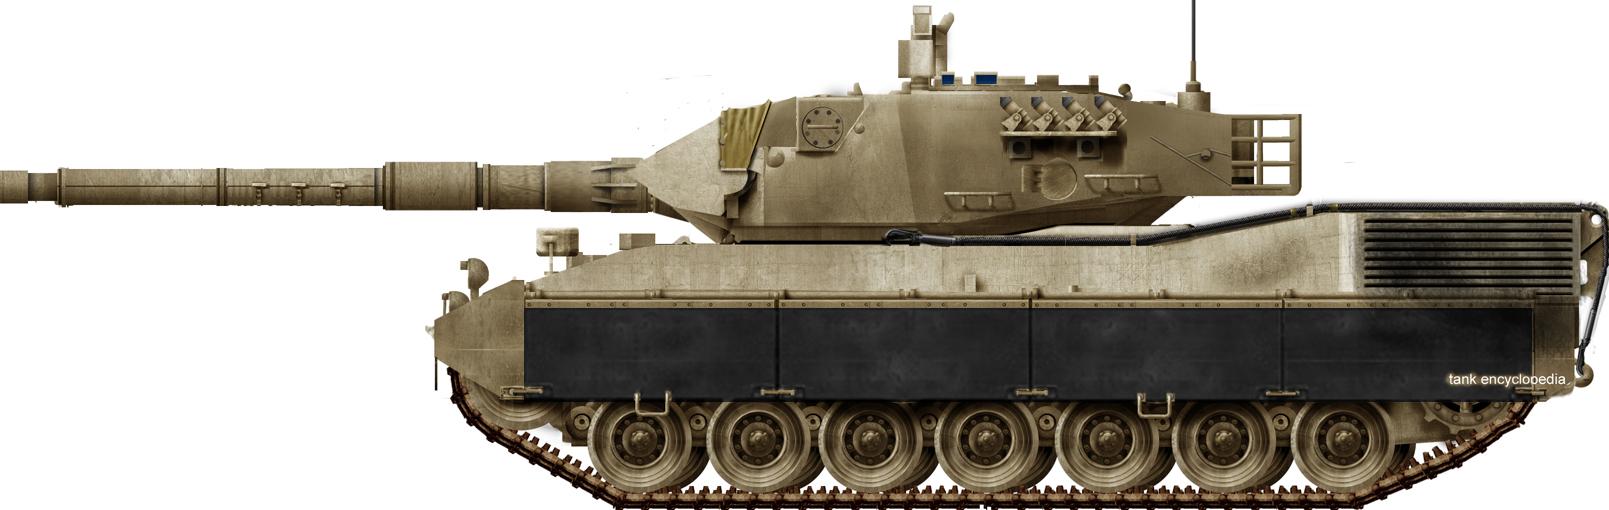 OF 40 Mk. 1 Main Battle Tank